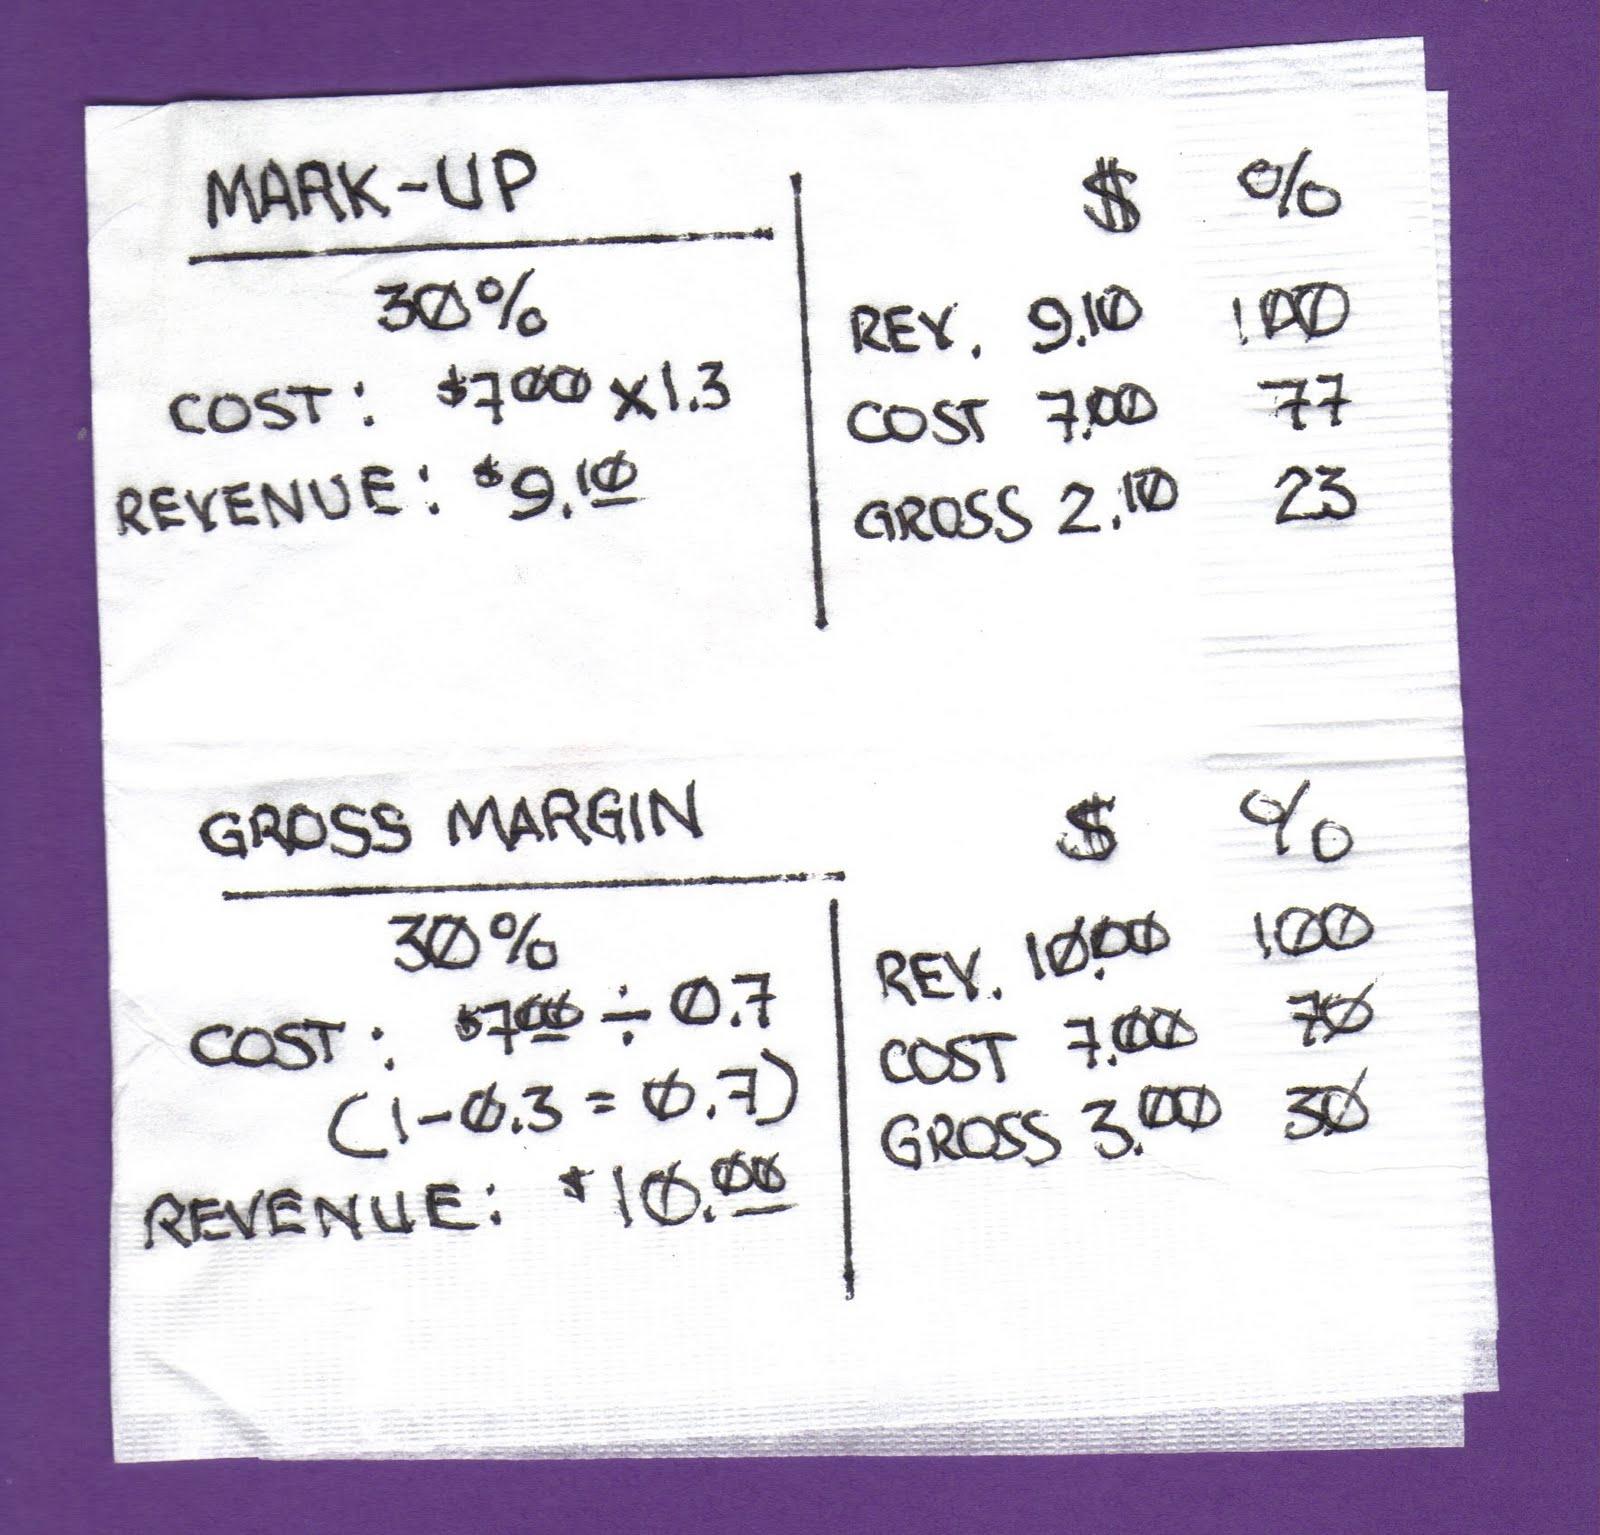 Margin Pricing: Organized Business: Margin Of Error